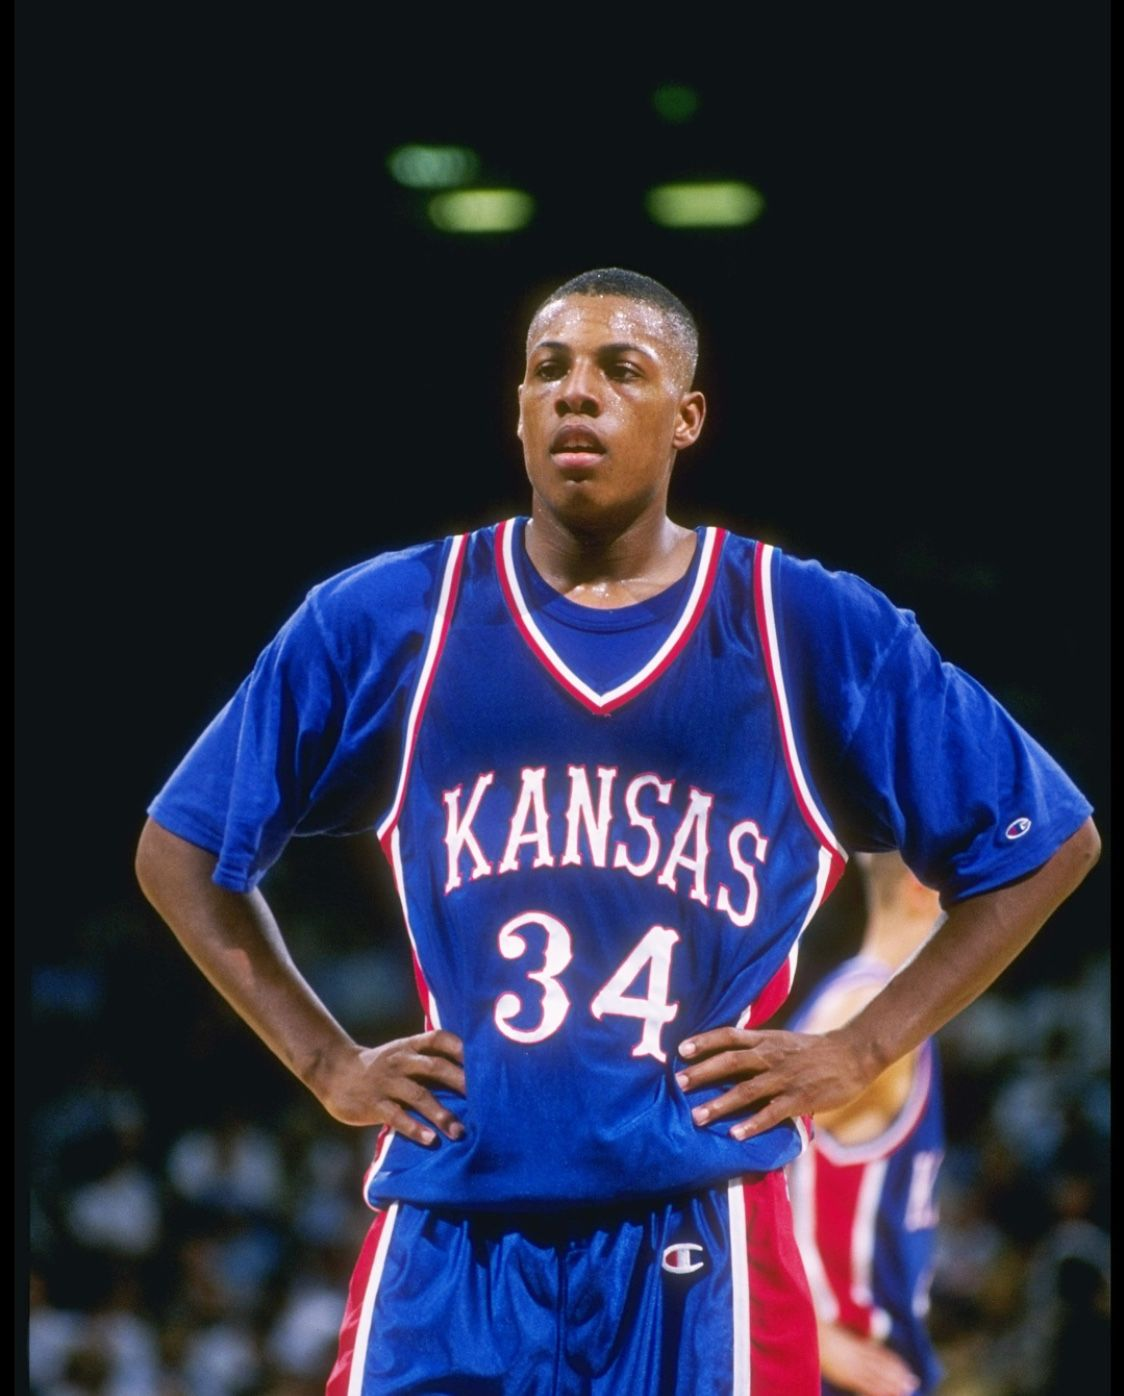 Paul Pierce Kansas Product Celtics Legend | Basketball legends ...